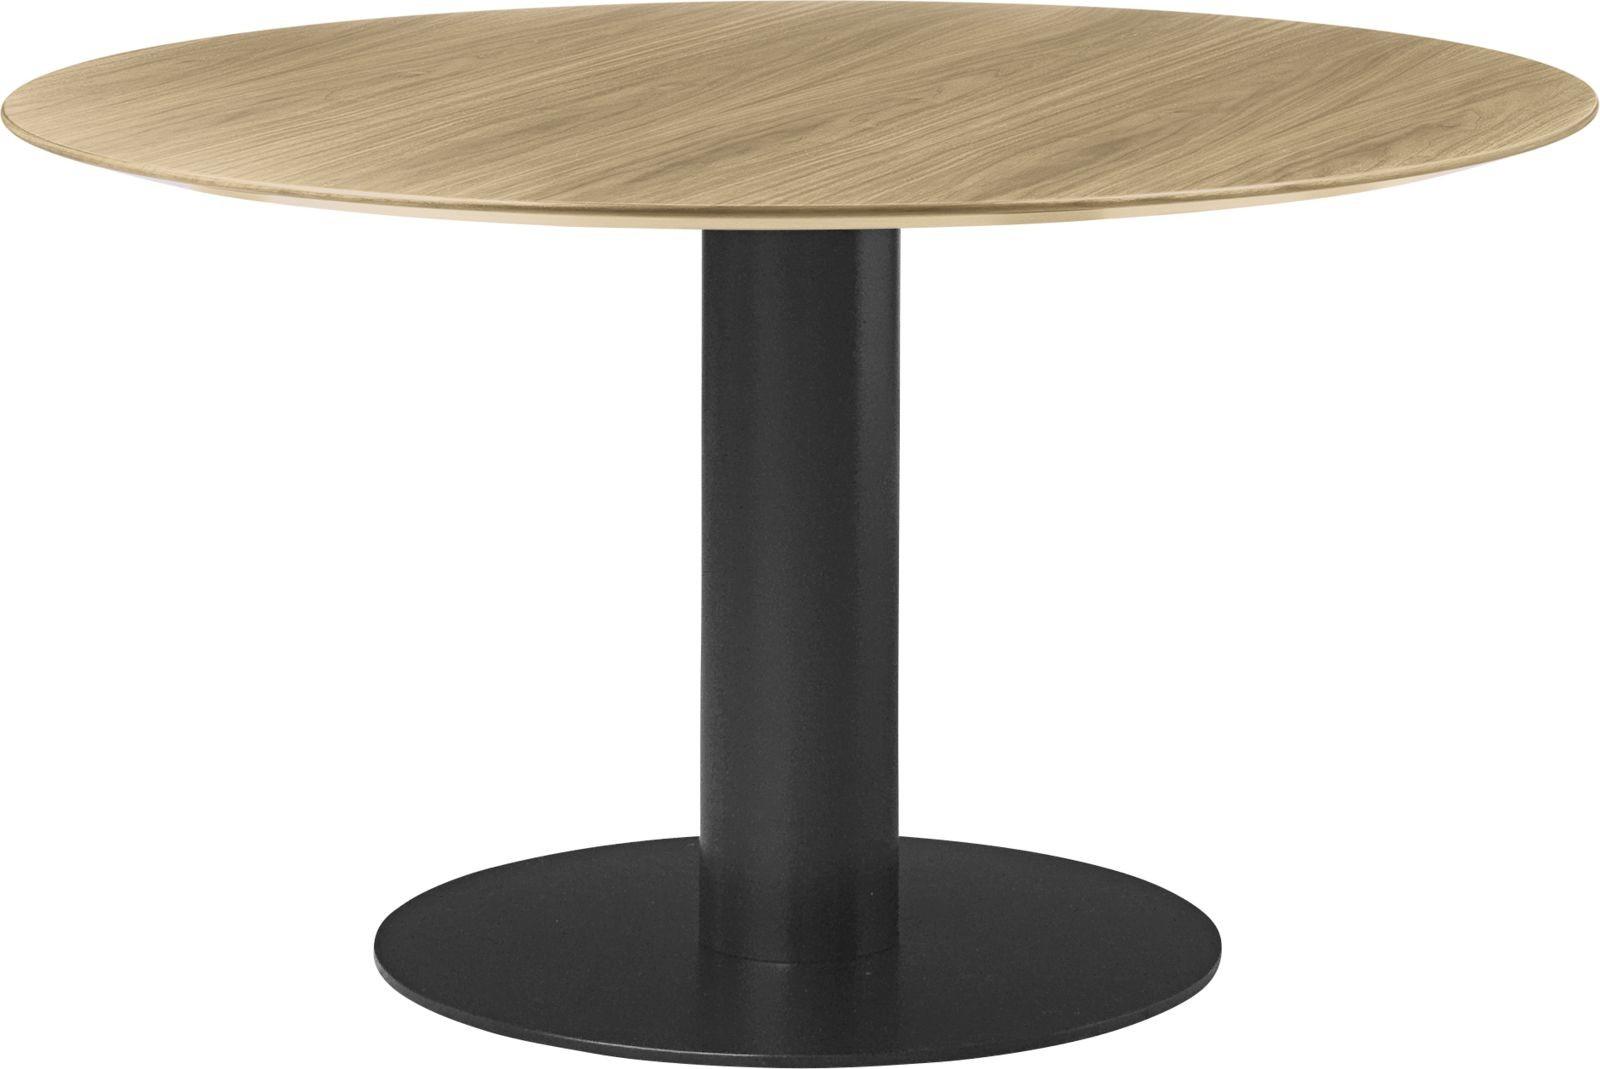 Gubi 2.0 Round Dining Table - Wood Gubi Metal Black, Gubi Wood Oak, 0130